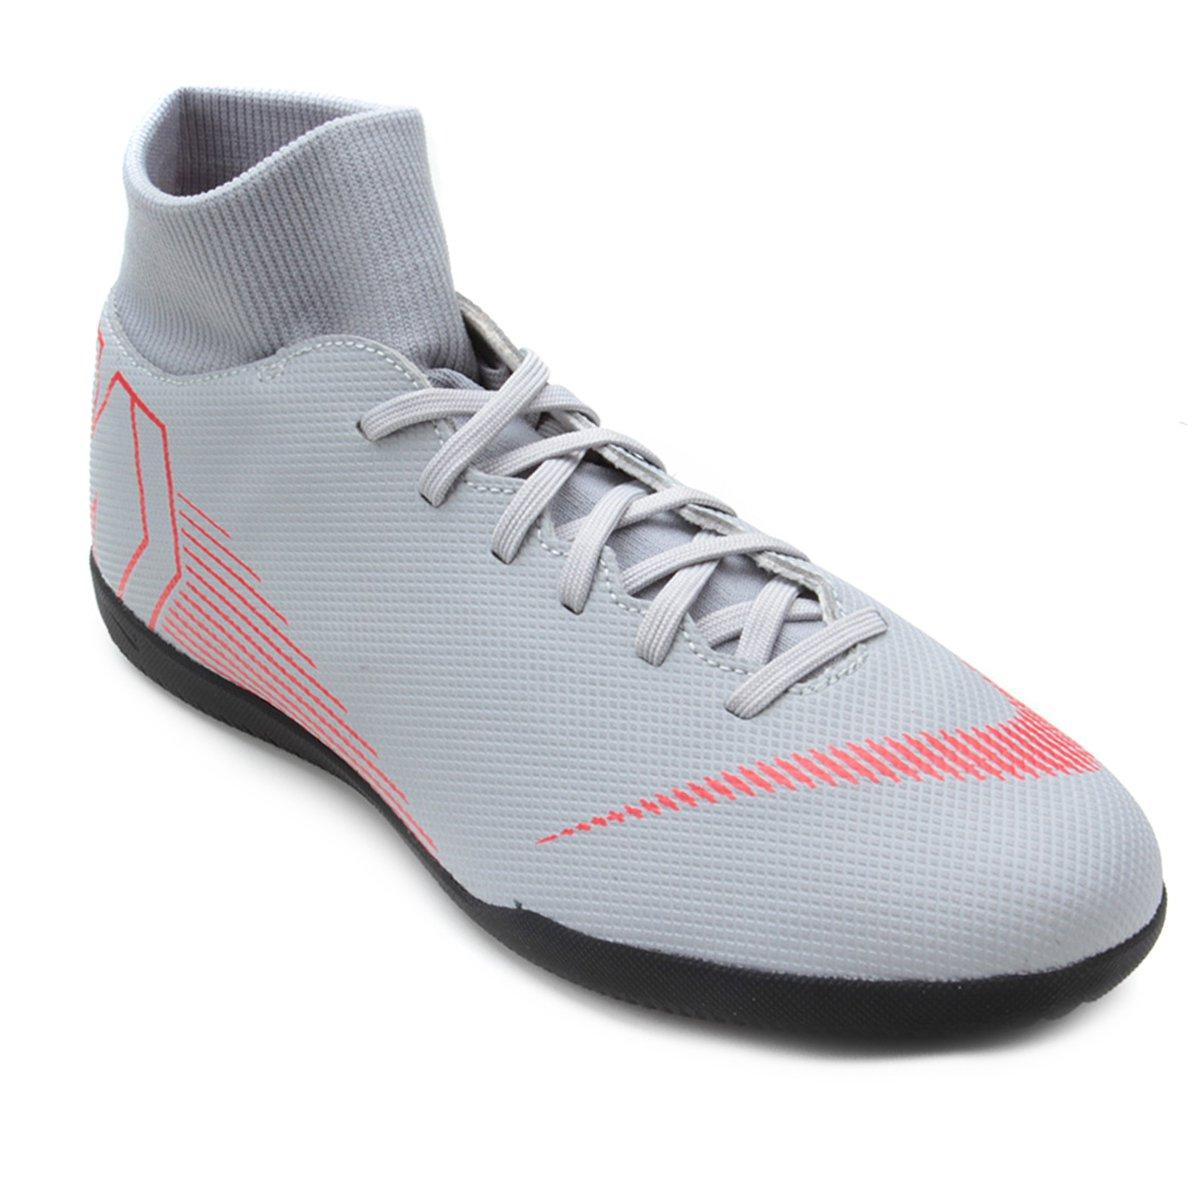 Chuteira Futsal Nike Mercurial Superfly 6 Club - Cinza - Compre ... 68eea0d1e75e5